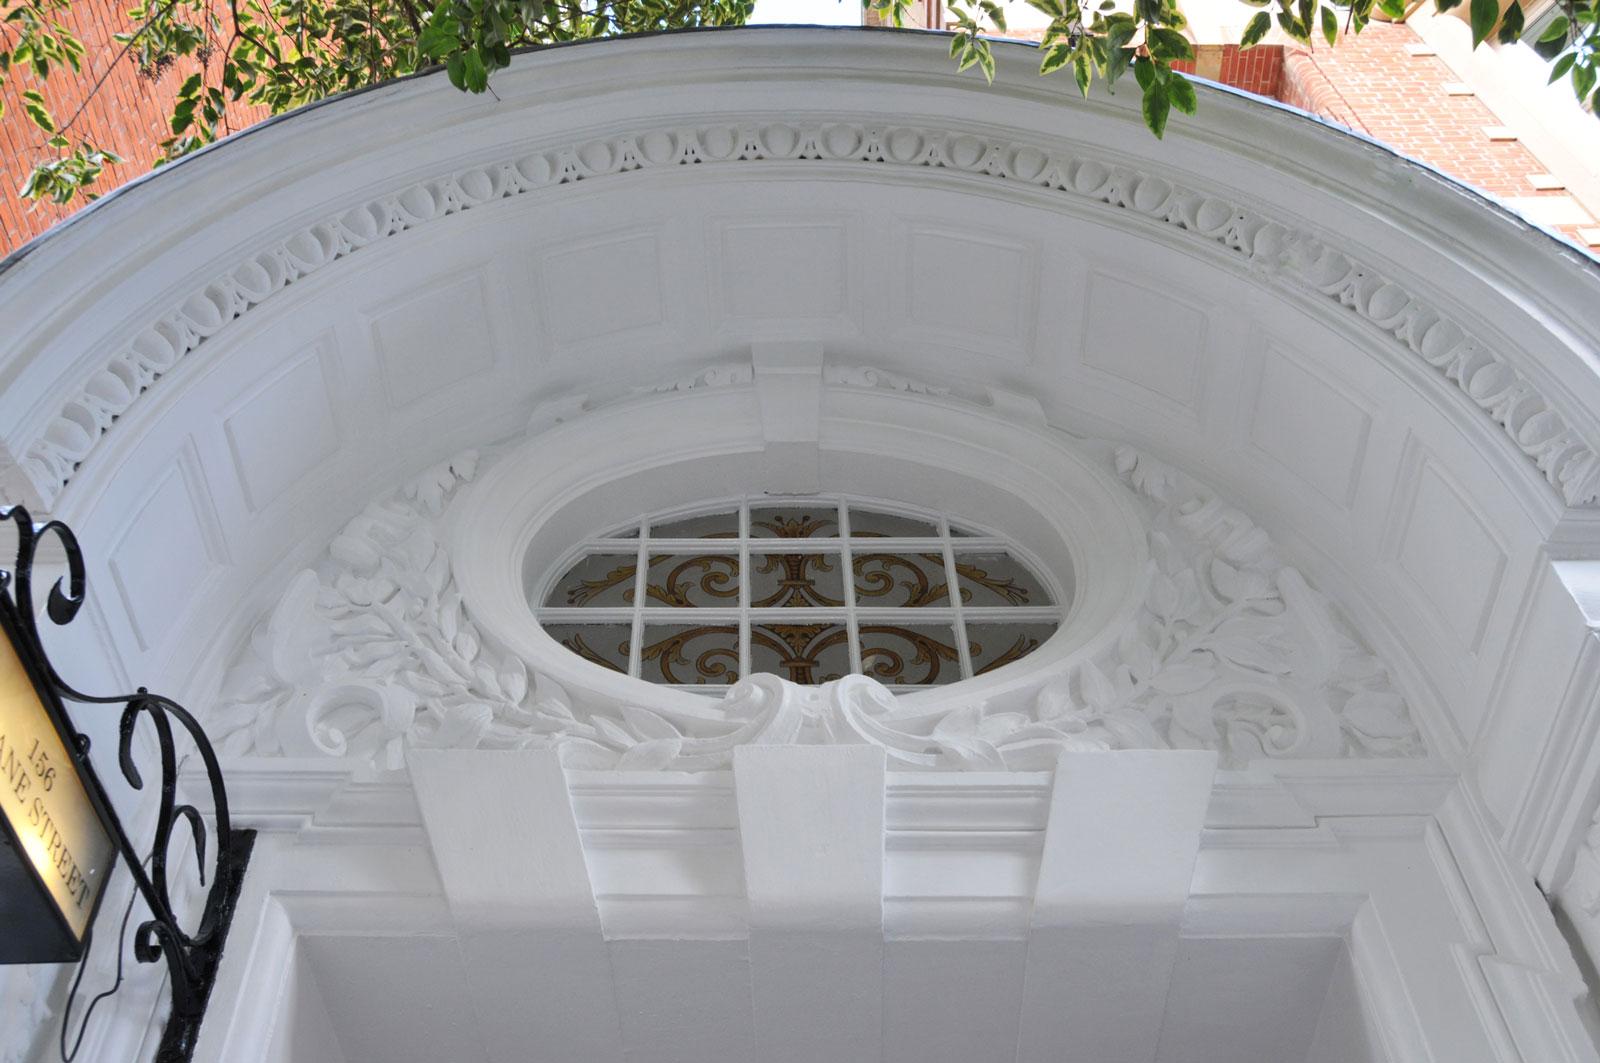 MFG Historic Conservation Building Surveyors London